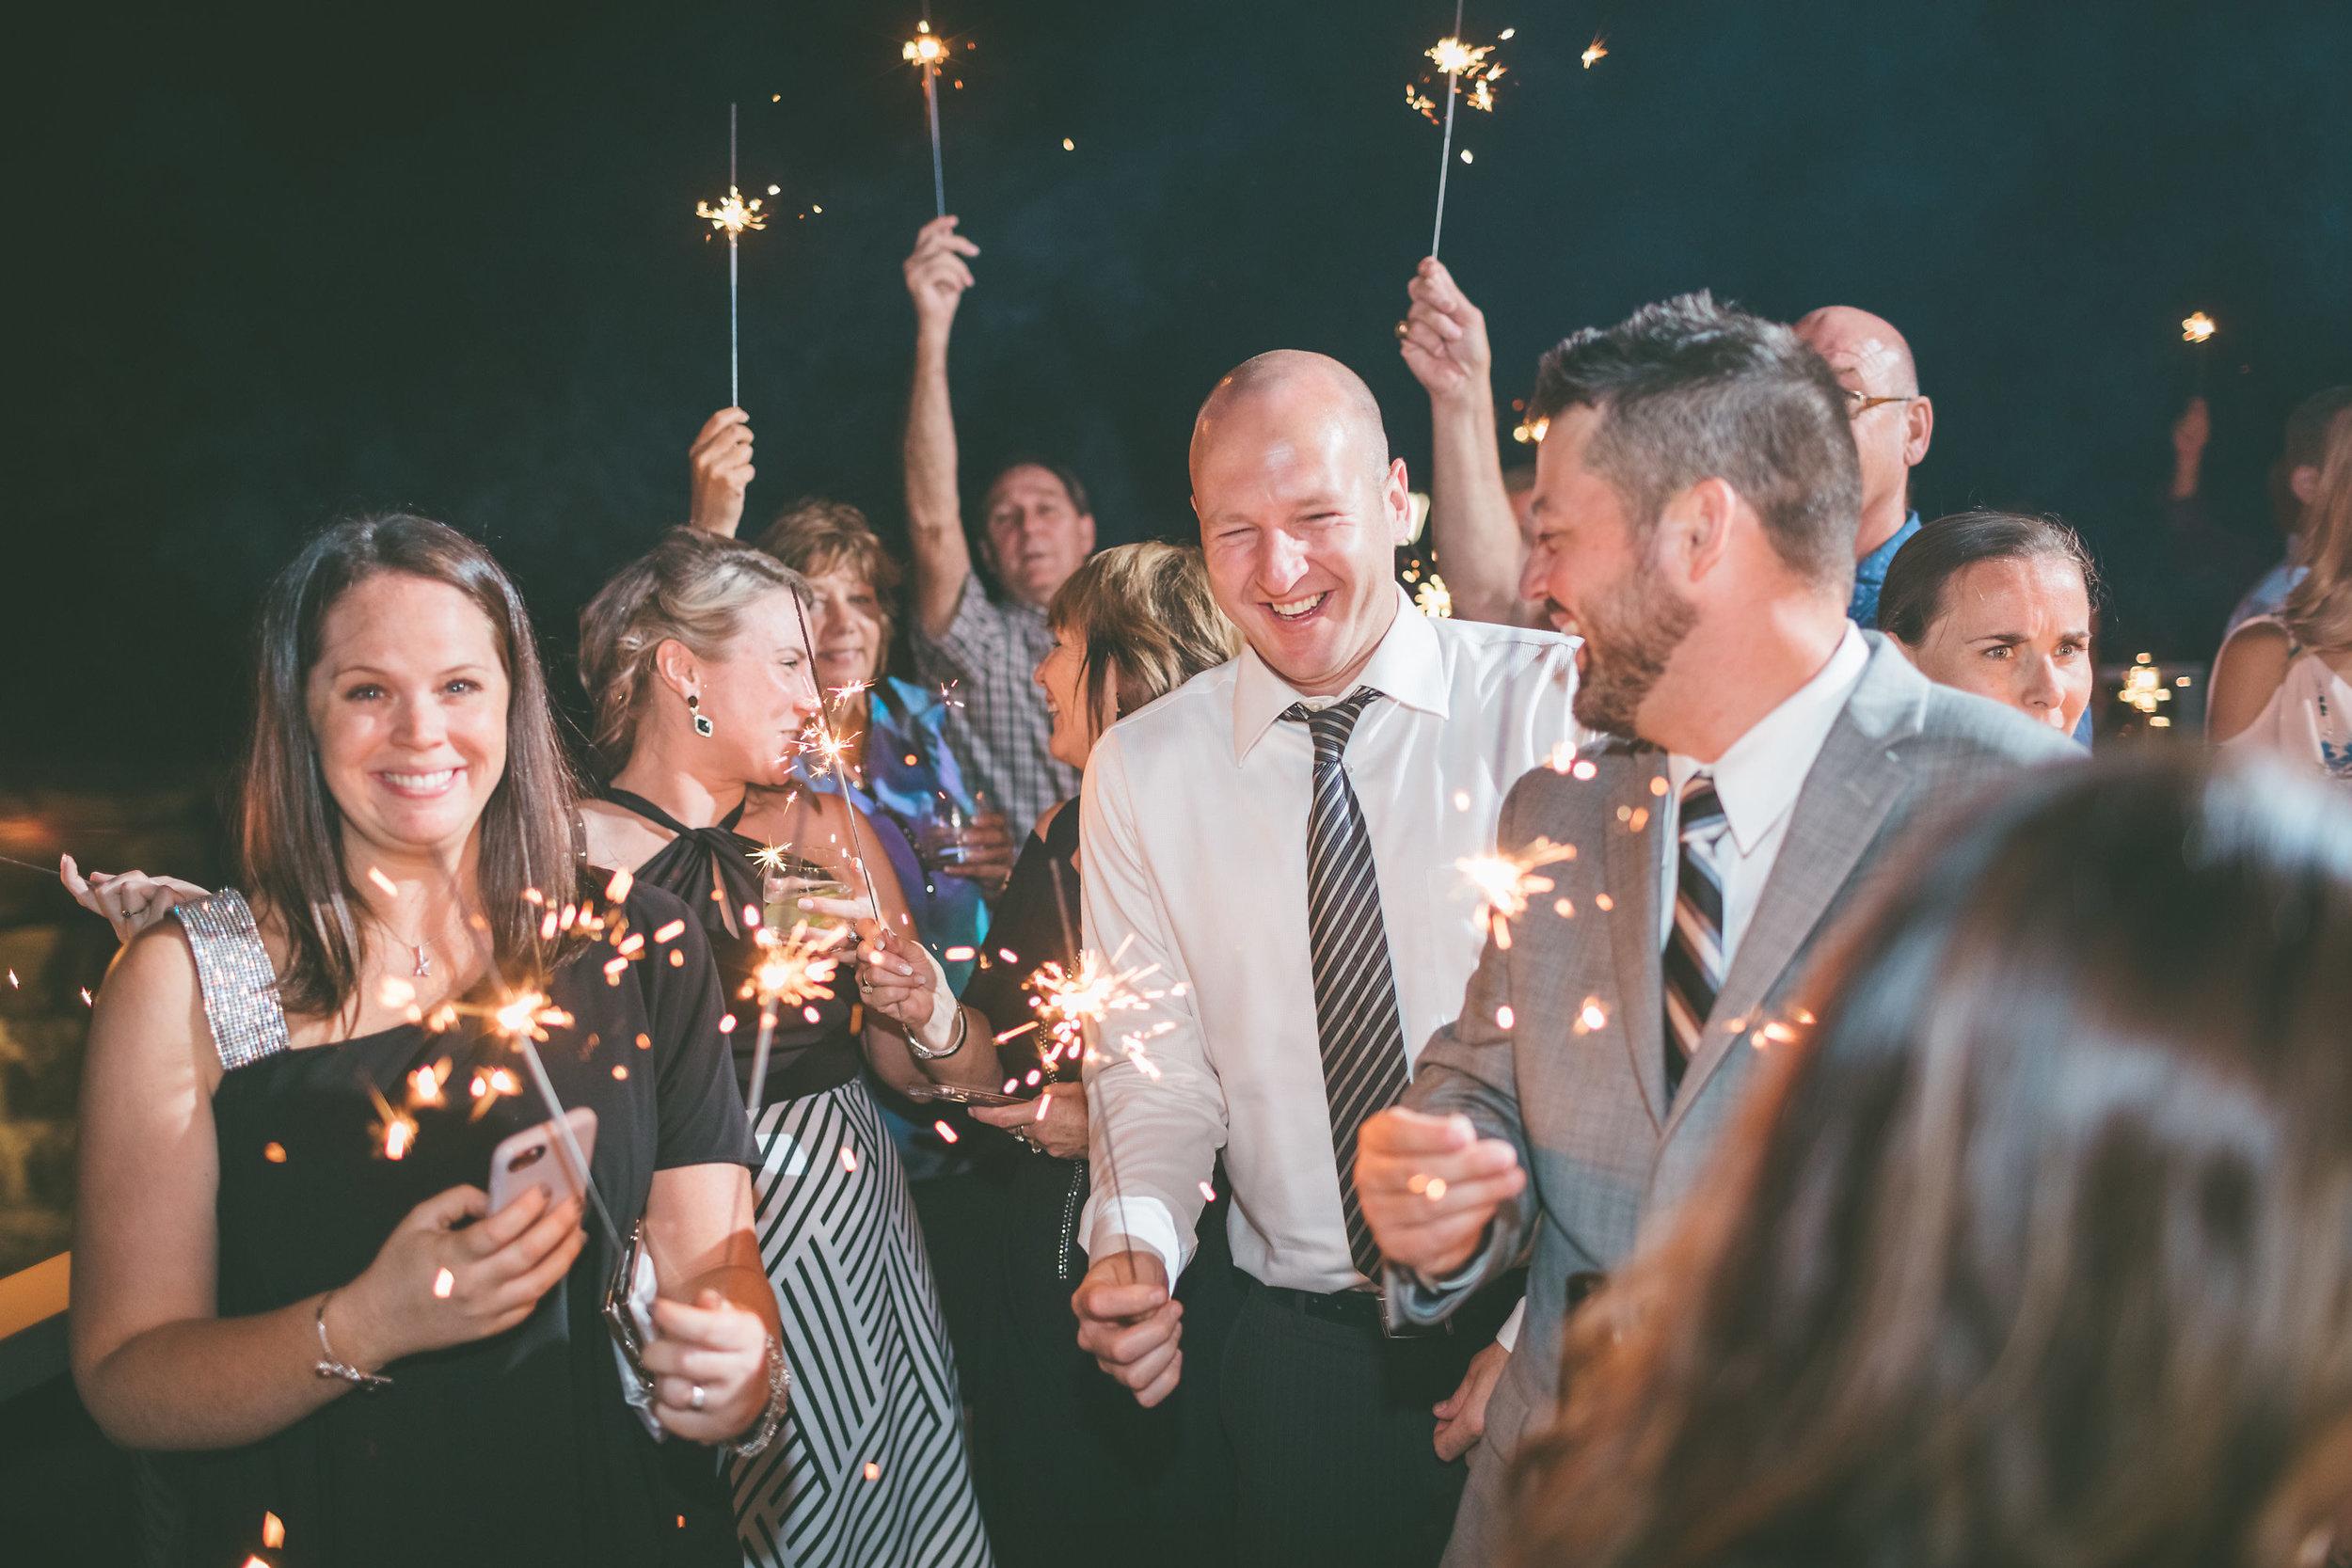 kelly___paul_wedding___lifesreel_danielcaruso___1654.jpg